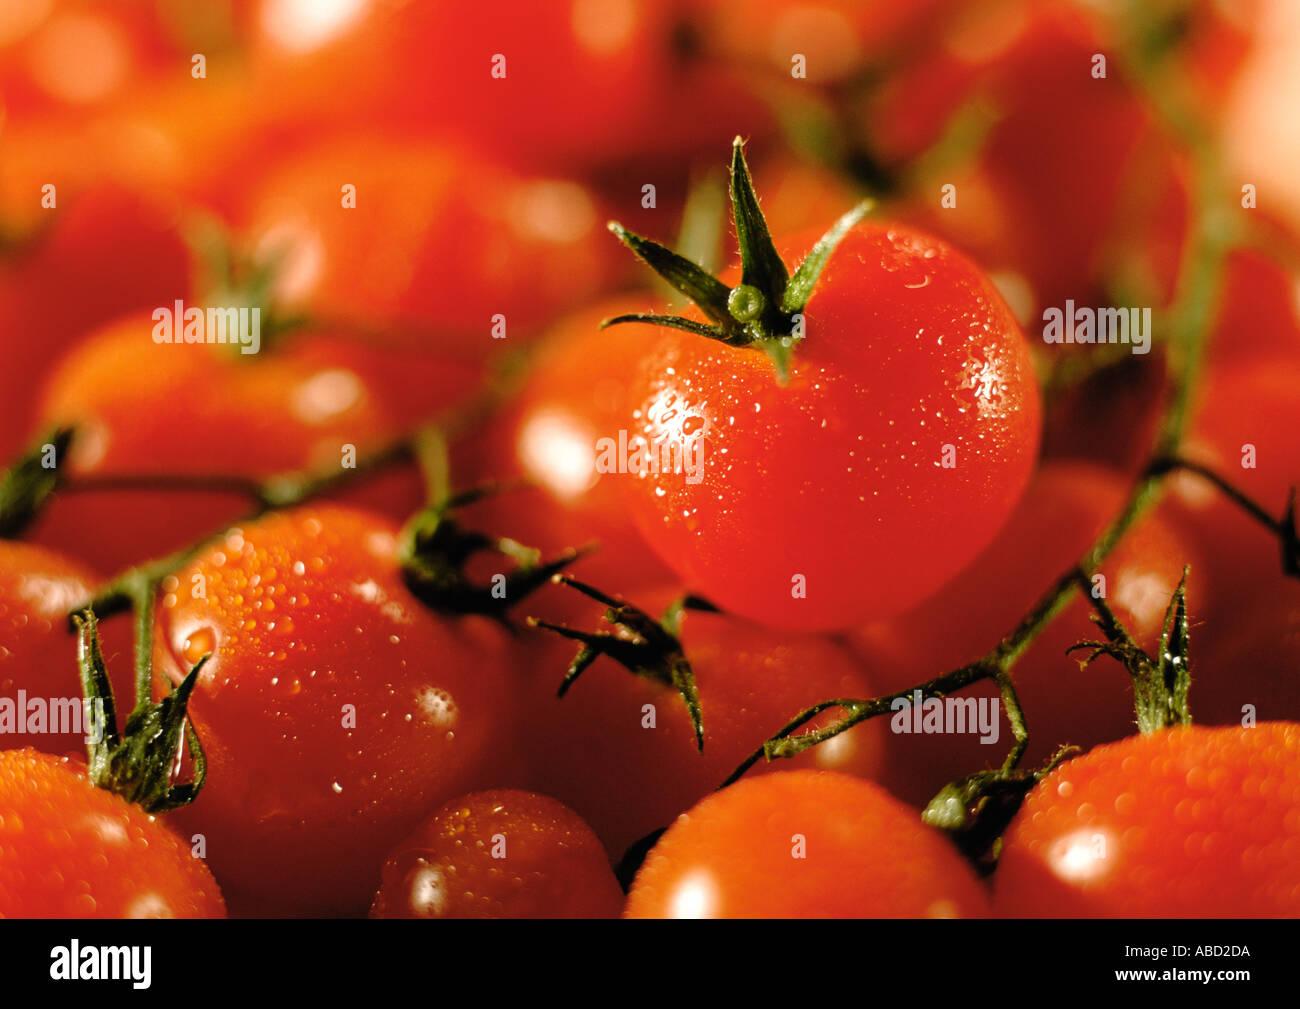 Fresh tomatoes on the vine - Stock Image